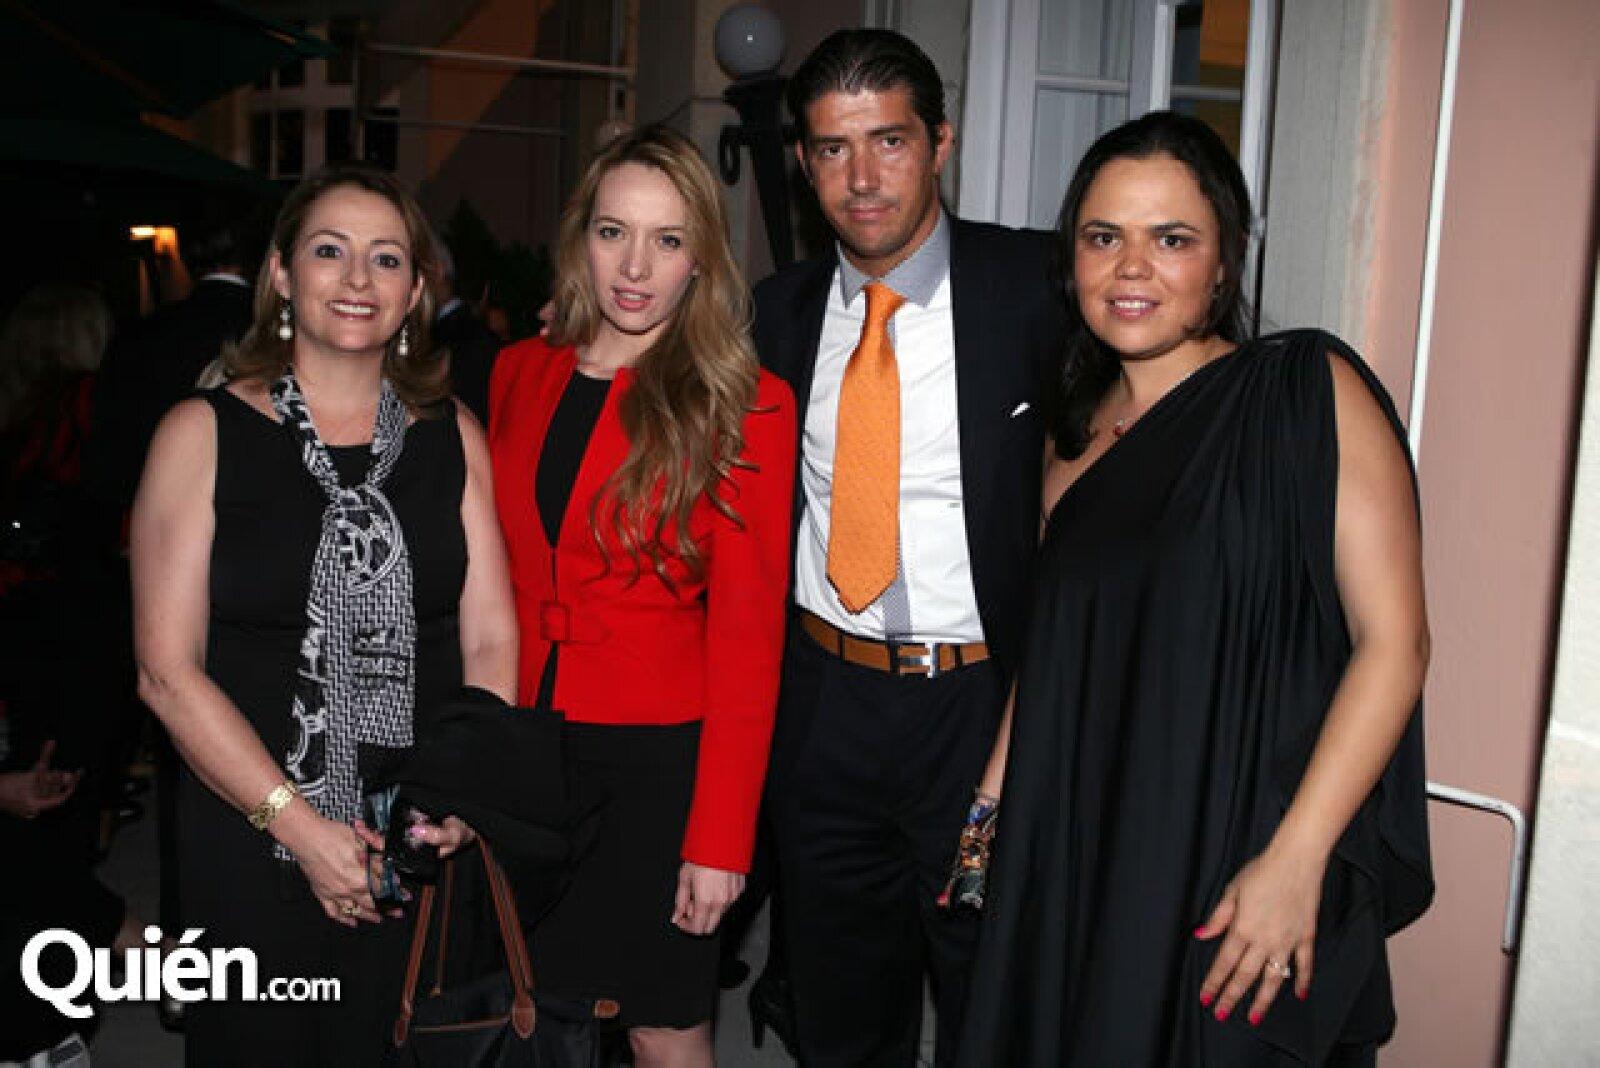 Teresa Smith,Carmen Gutiérrez,Santiago Balbin,Mariana Gómez del Campo